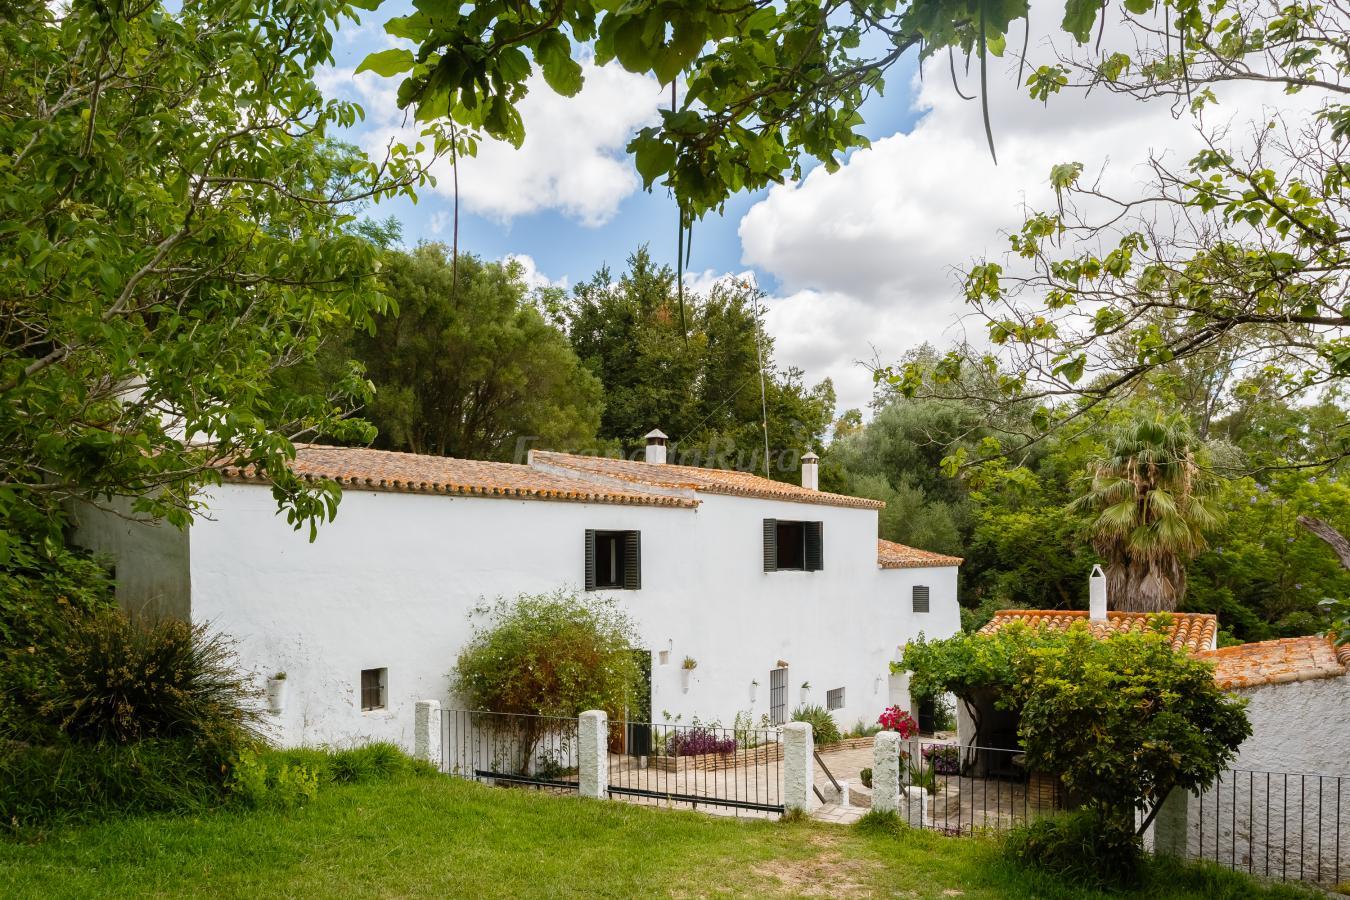 Fotos de molino naranjo casa rural en medina sidonia c diz - Casa rural medina sidonia ...